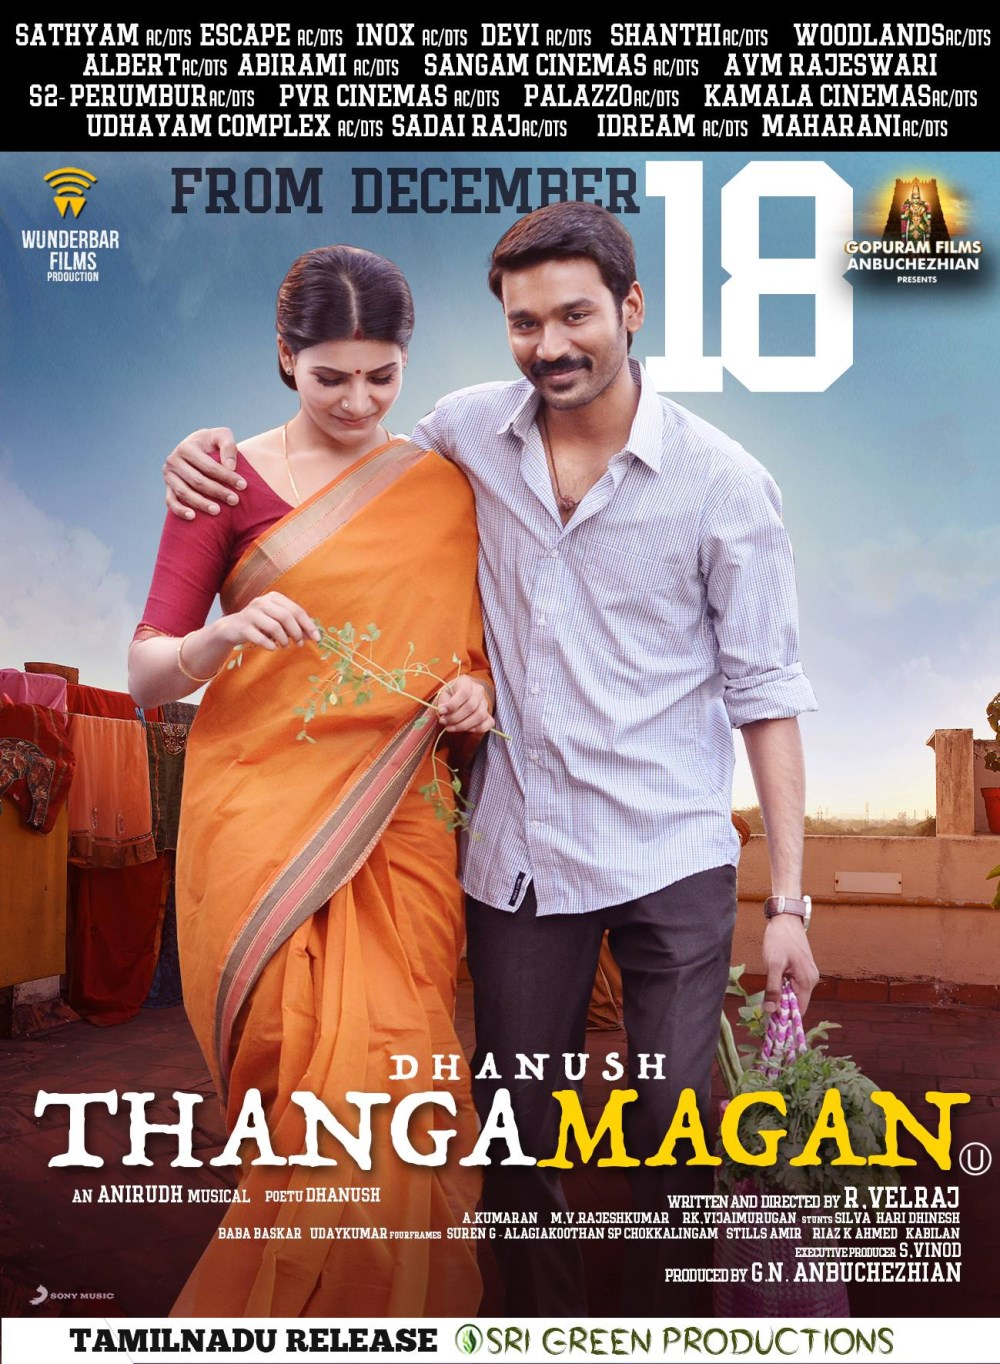 Samantha, Dhanush in Thanga Magan Movie Release Posters